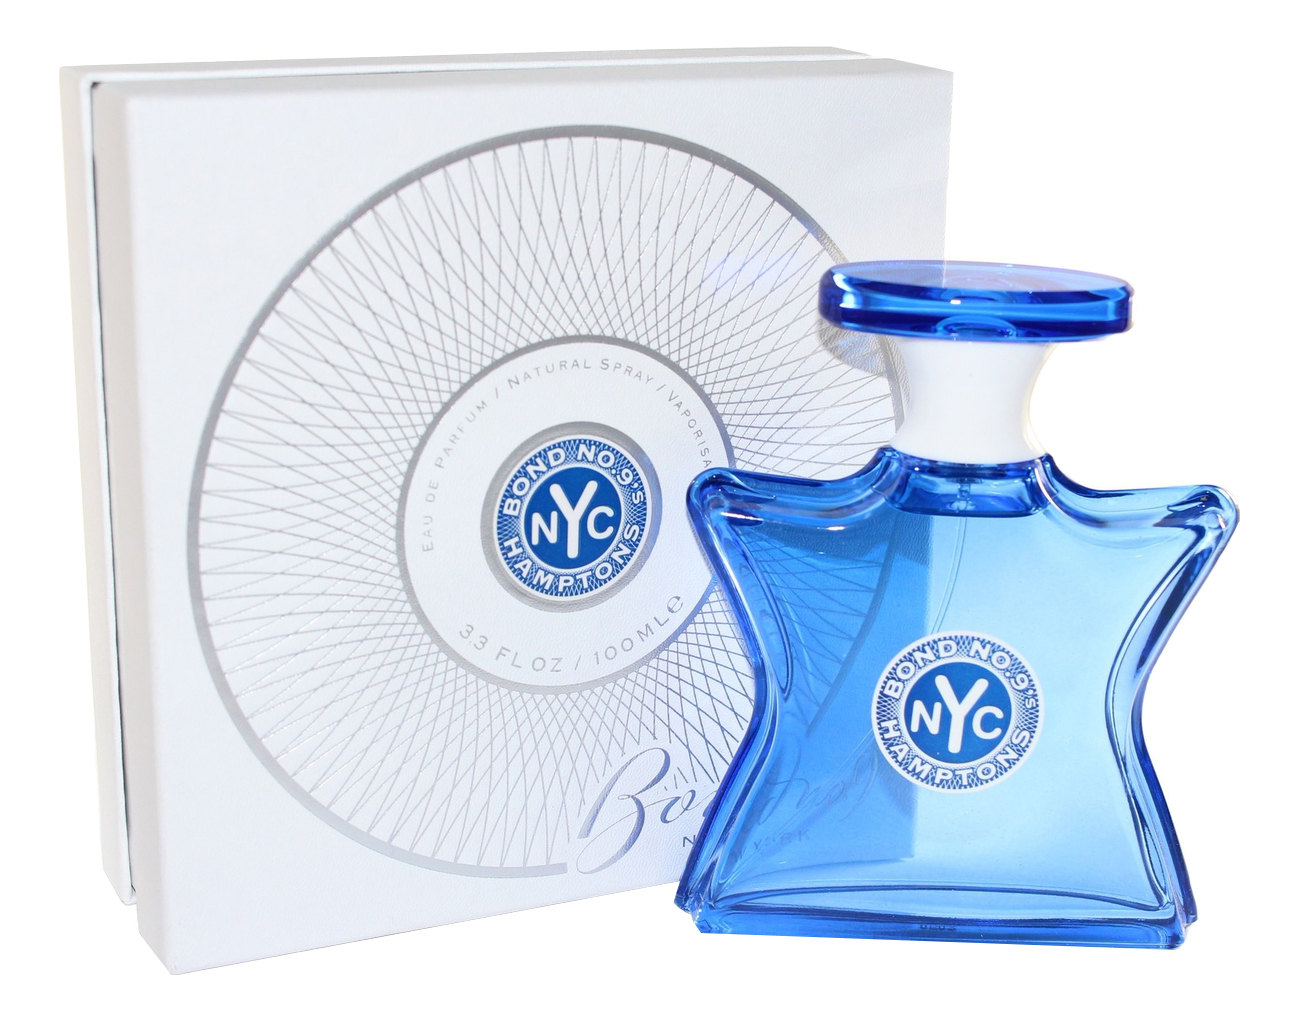 Bond No 9 Hamptons: парфюмерная вода 100мл